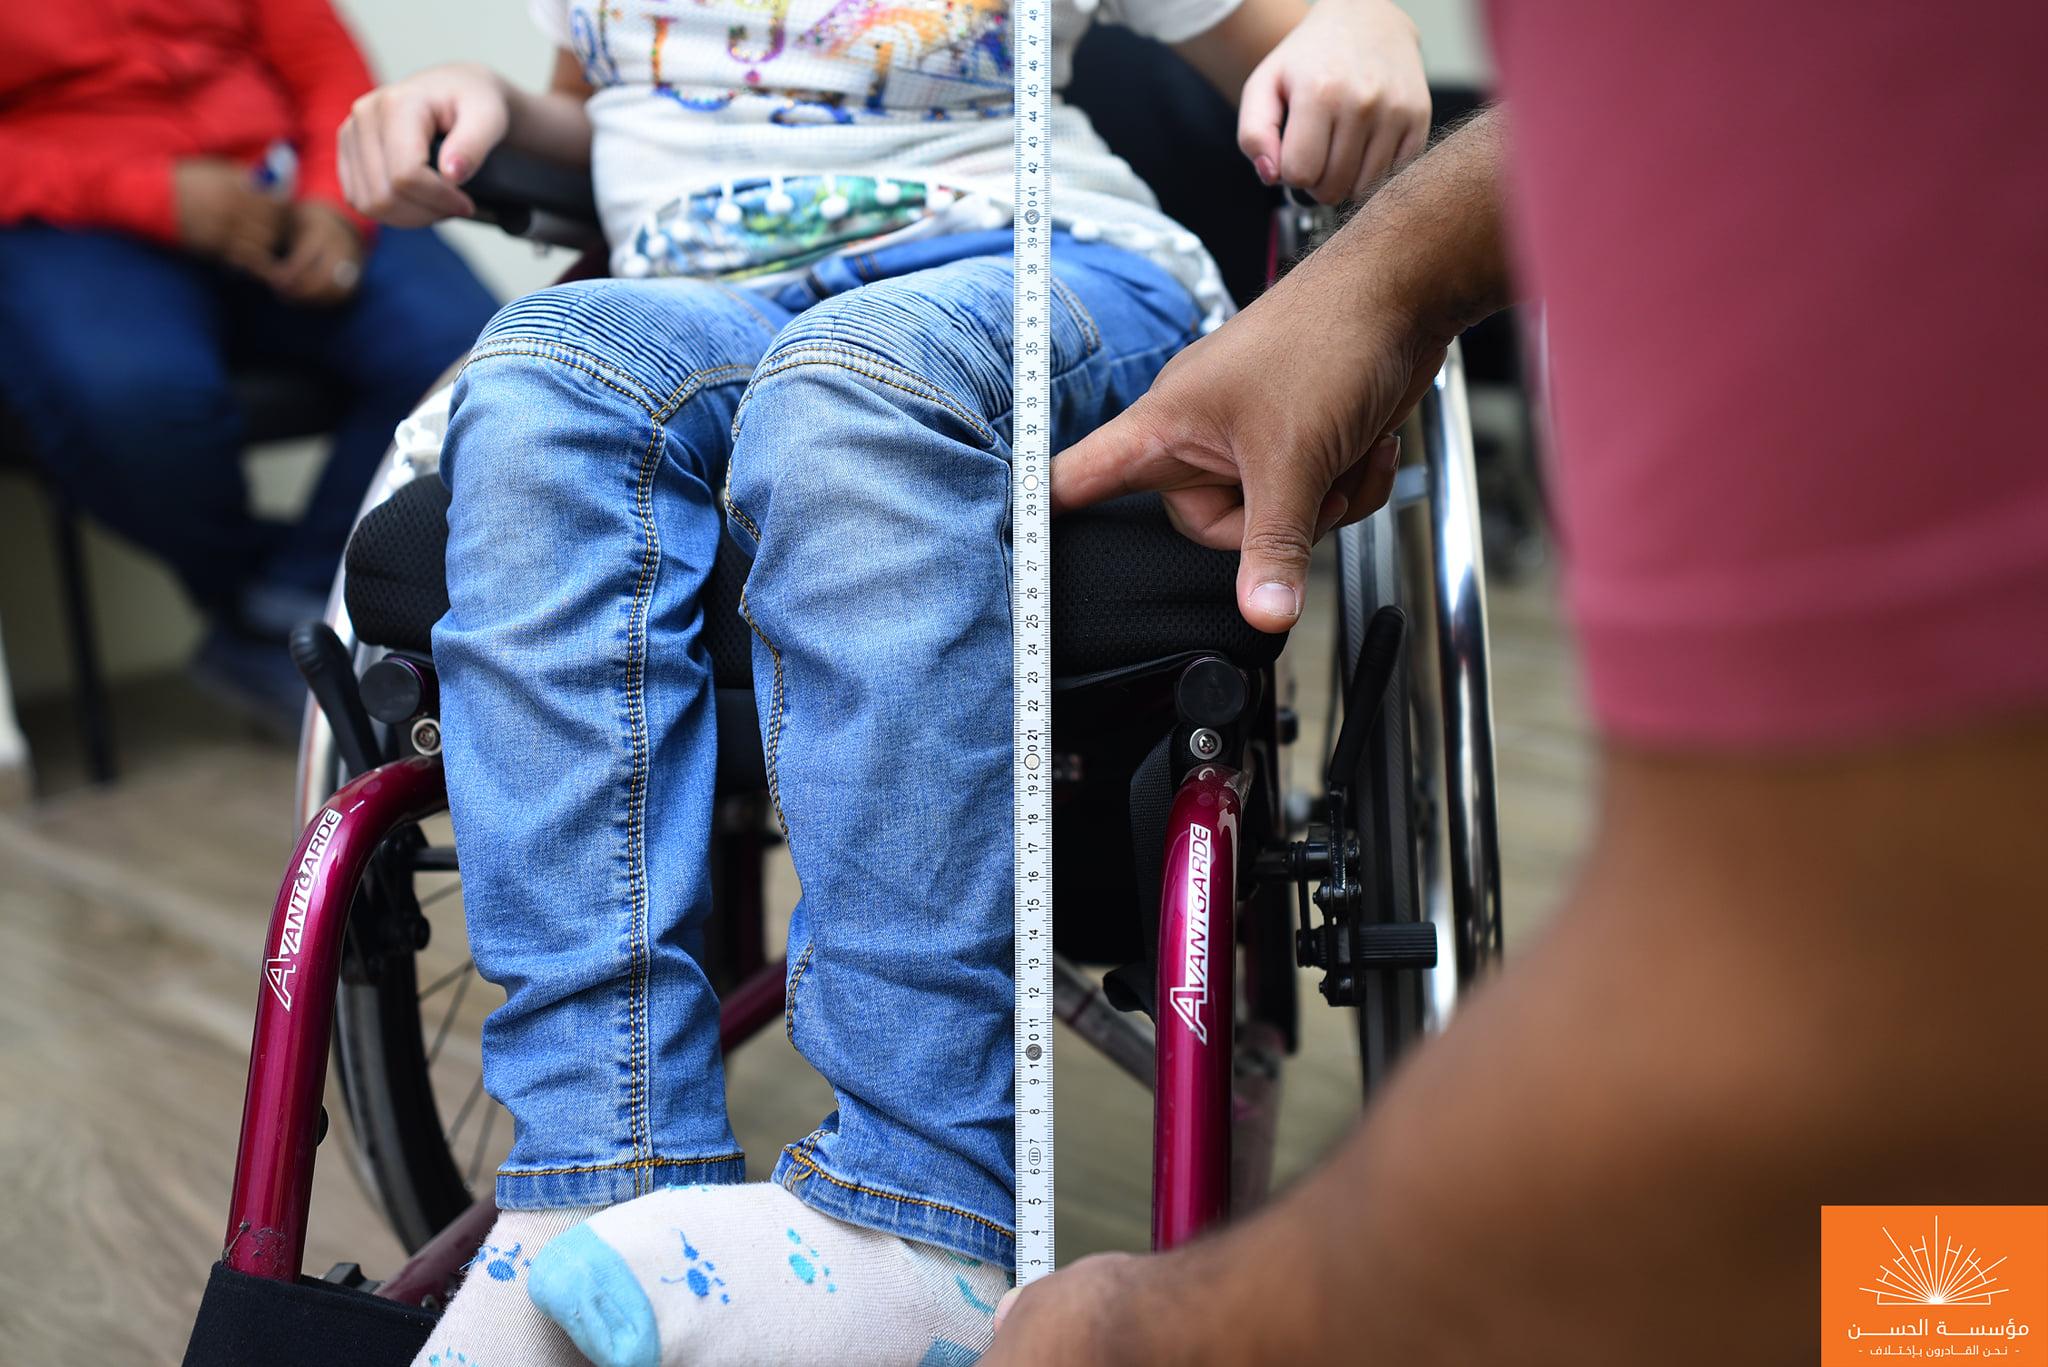 Customized Wheelchairs